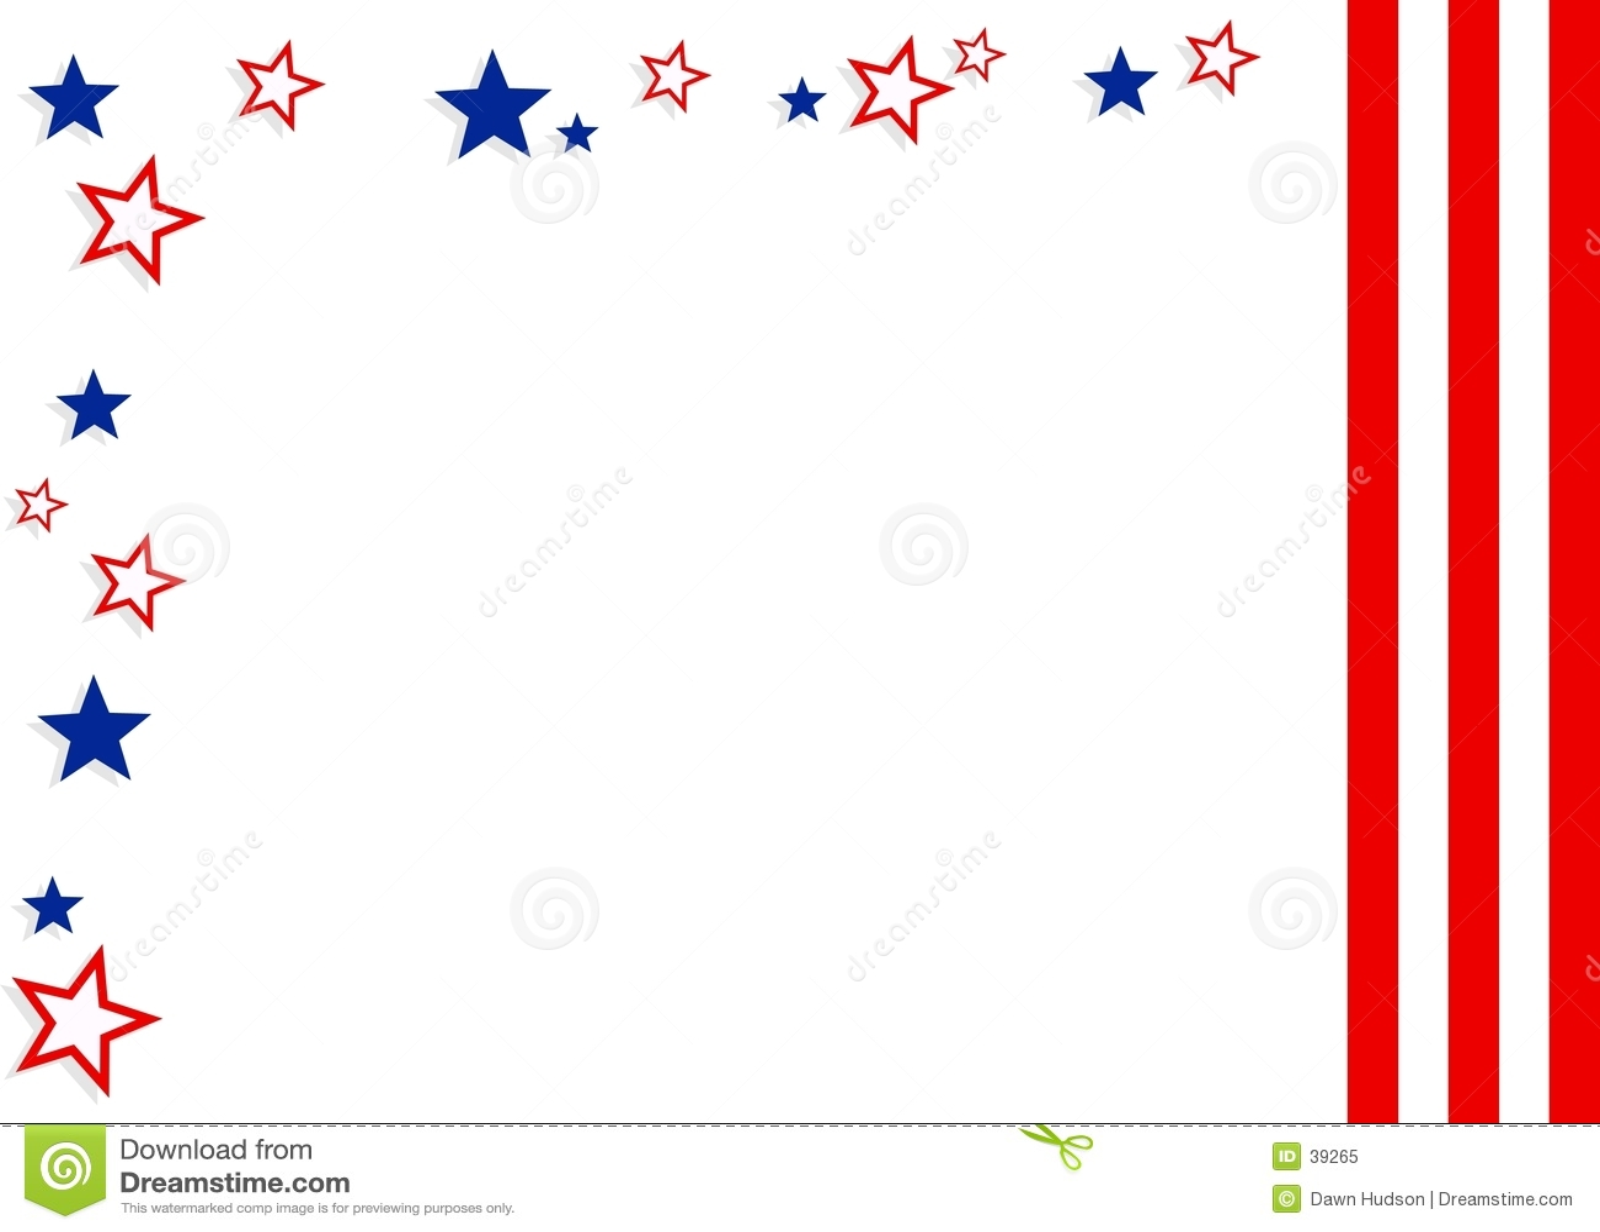 patriotic background stock illustration illustration of graphics